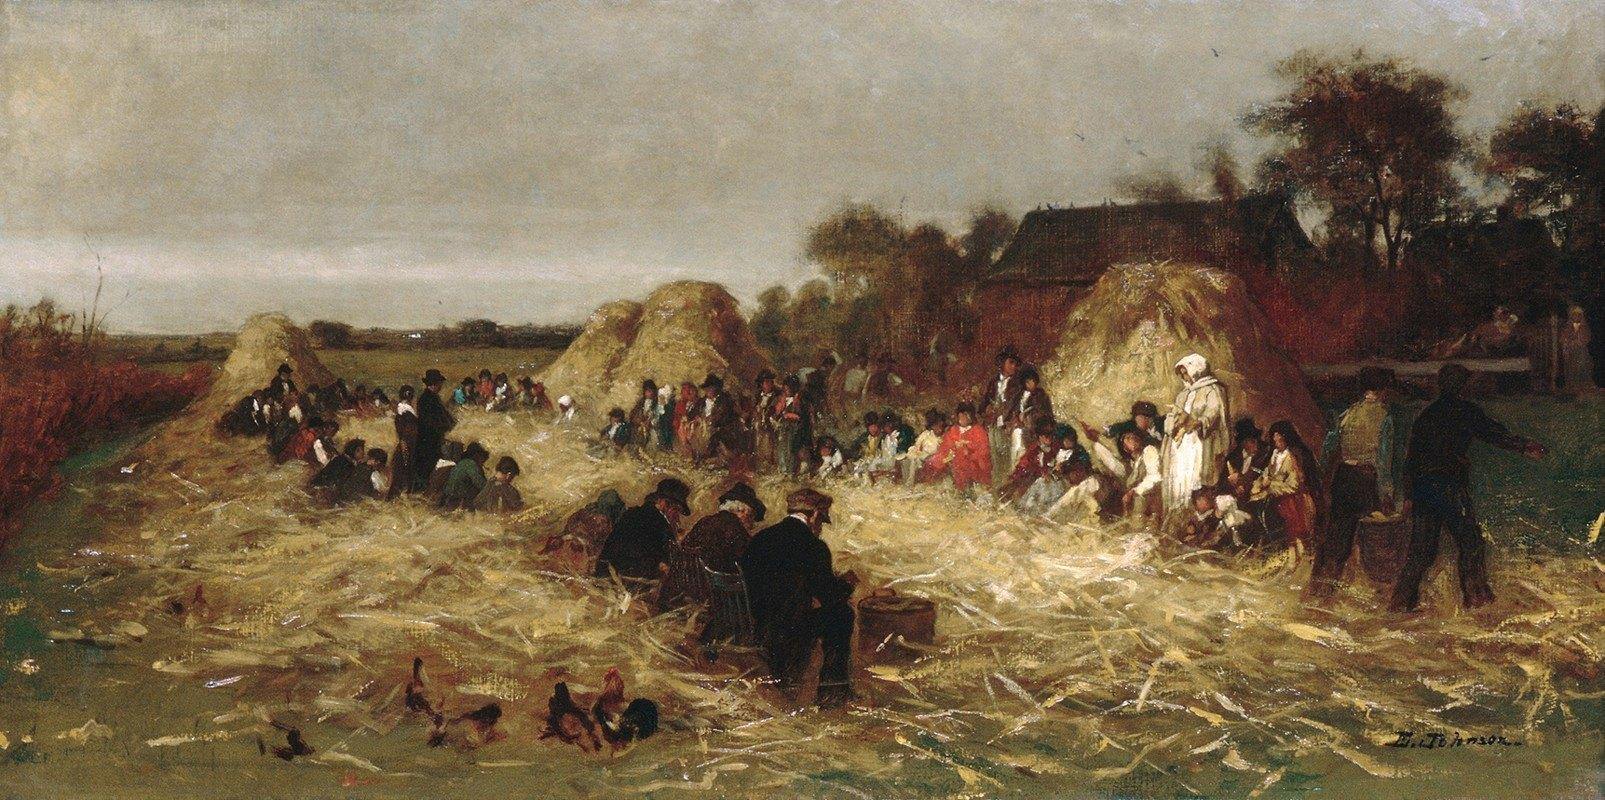 Eastman Johnson - Corn Husking at Nantucket